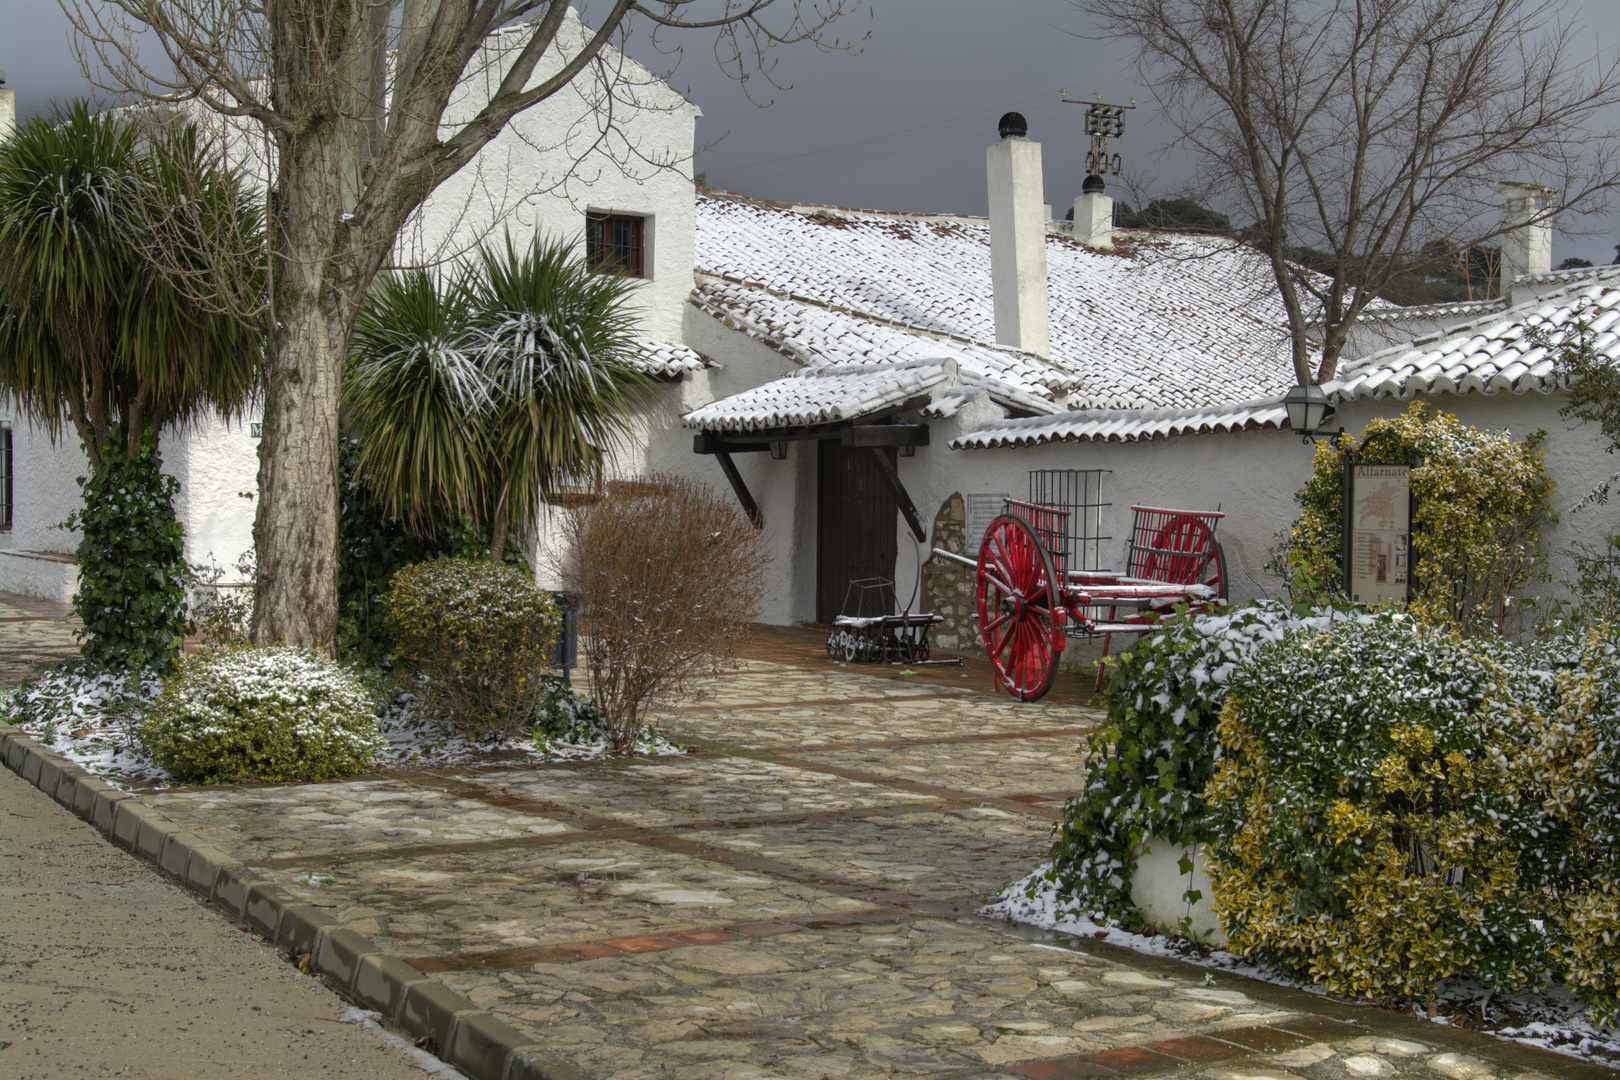 HDR Venta de Alfarnate Con Nieve